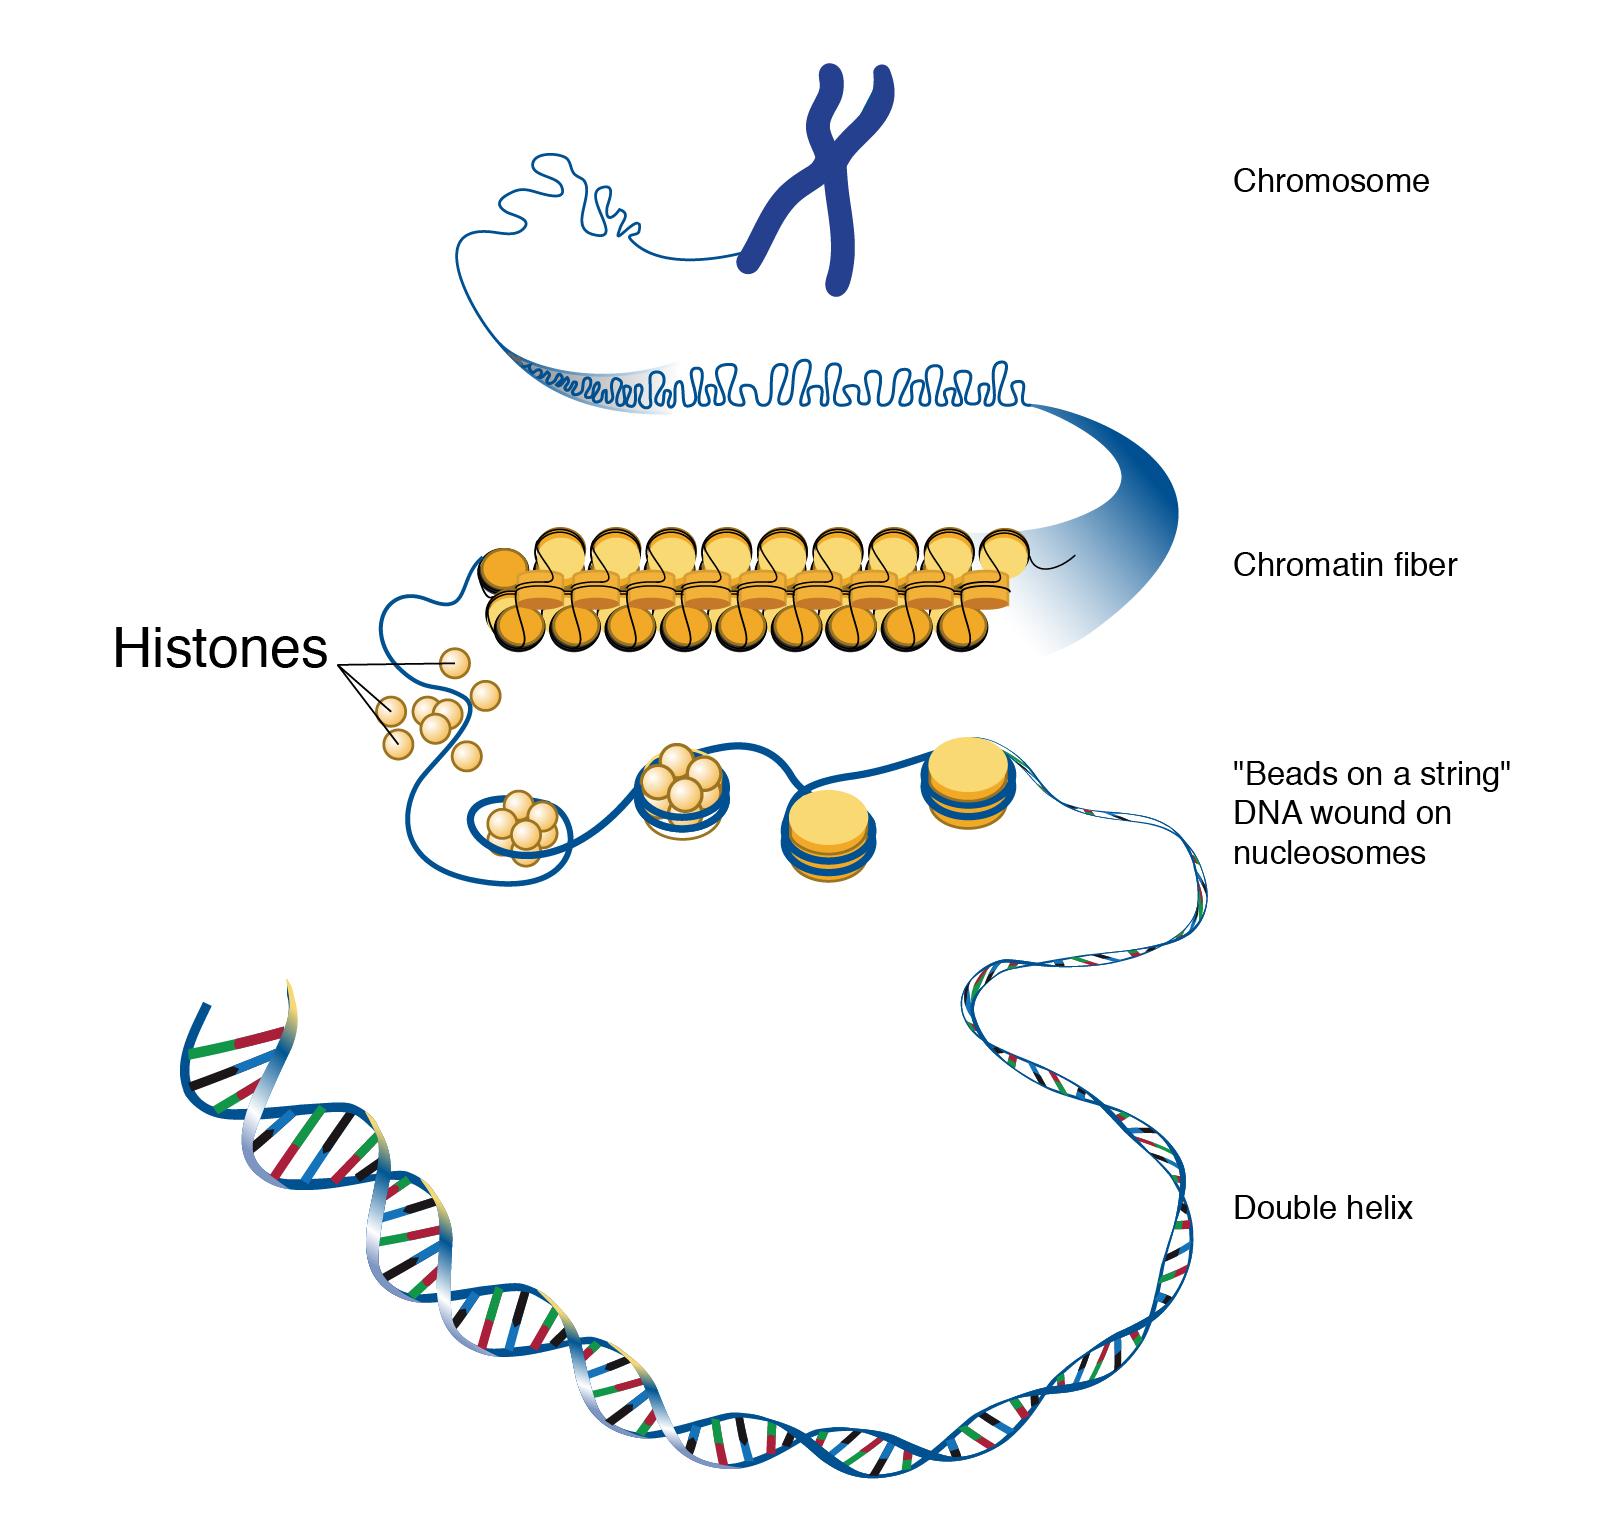 Histone